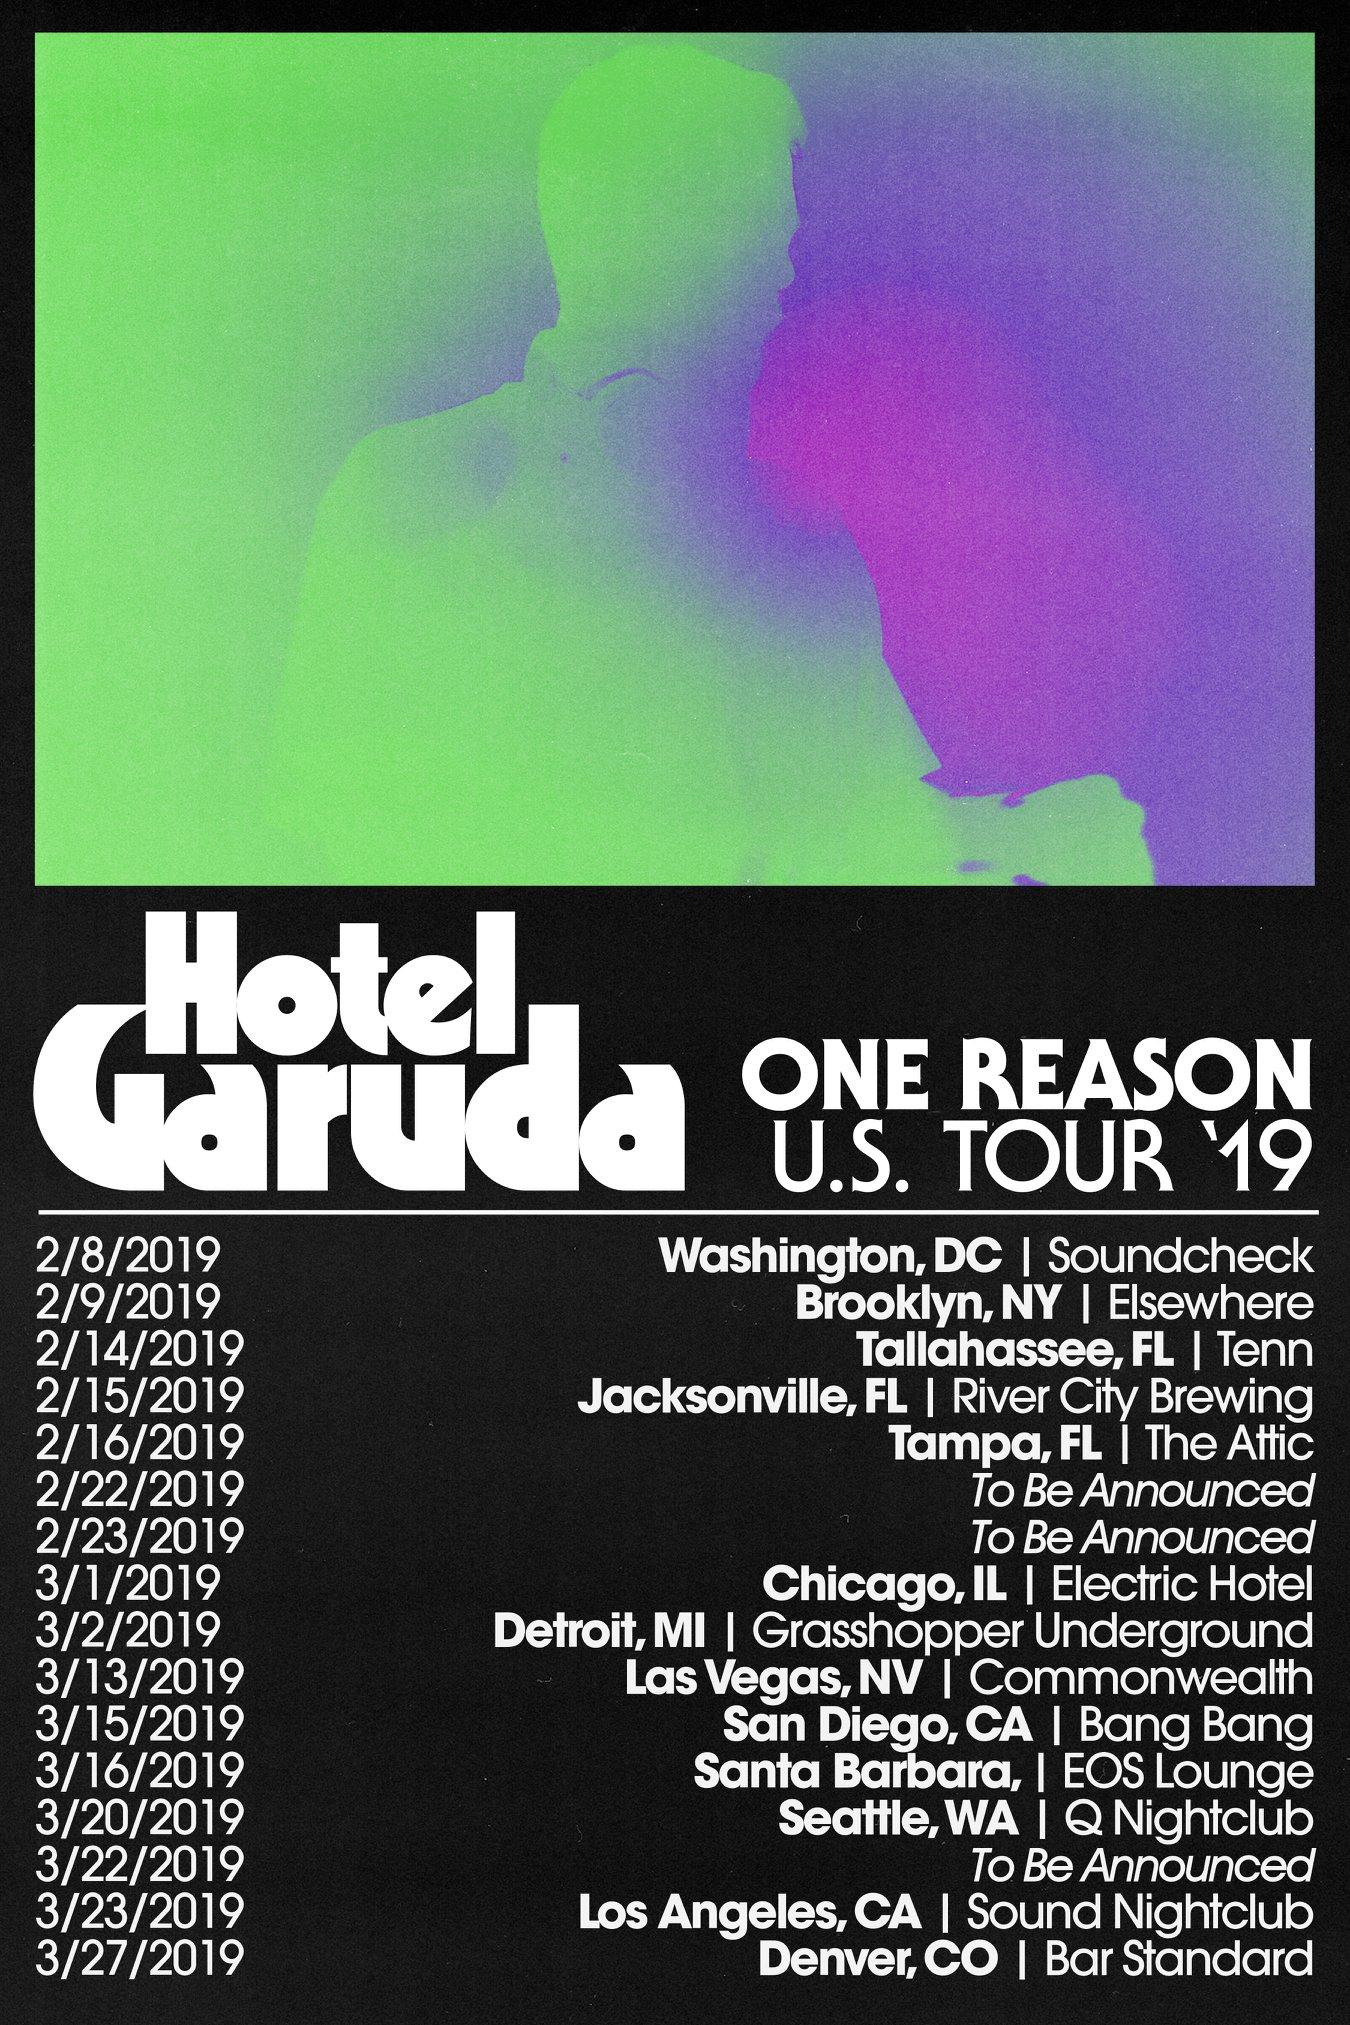 Hotel Garuda One Reason US Tour 2019